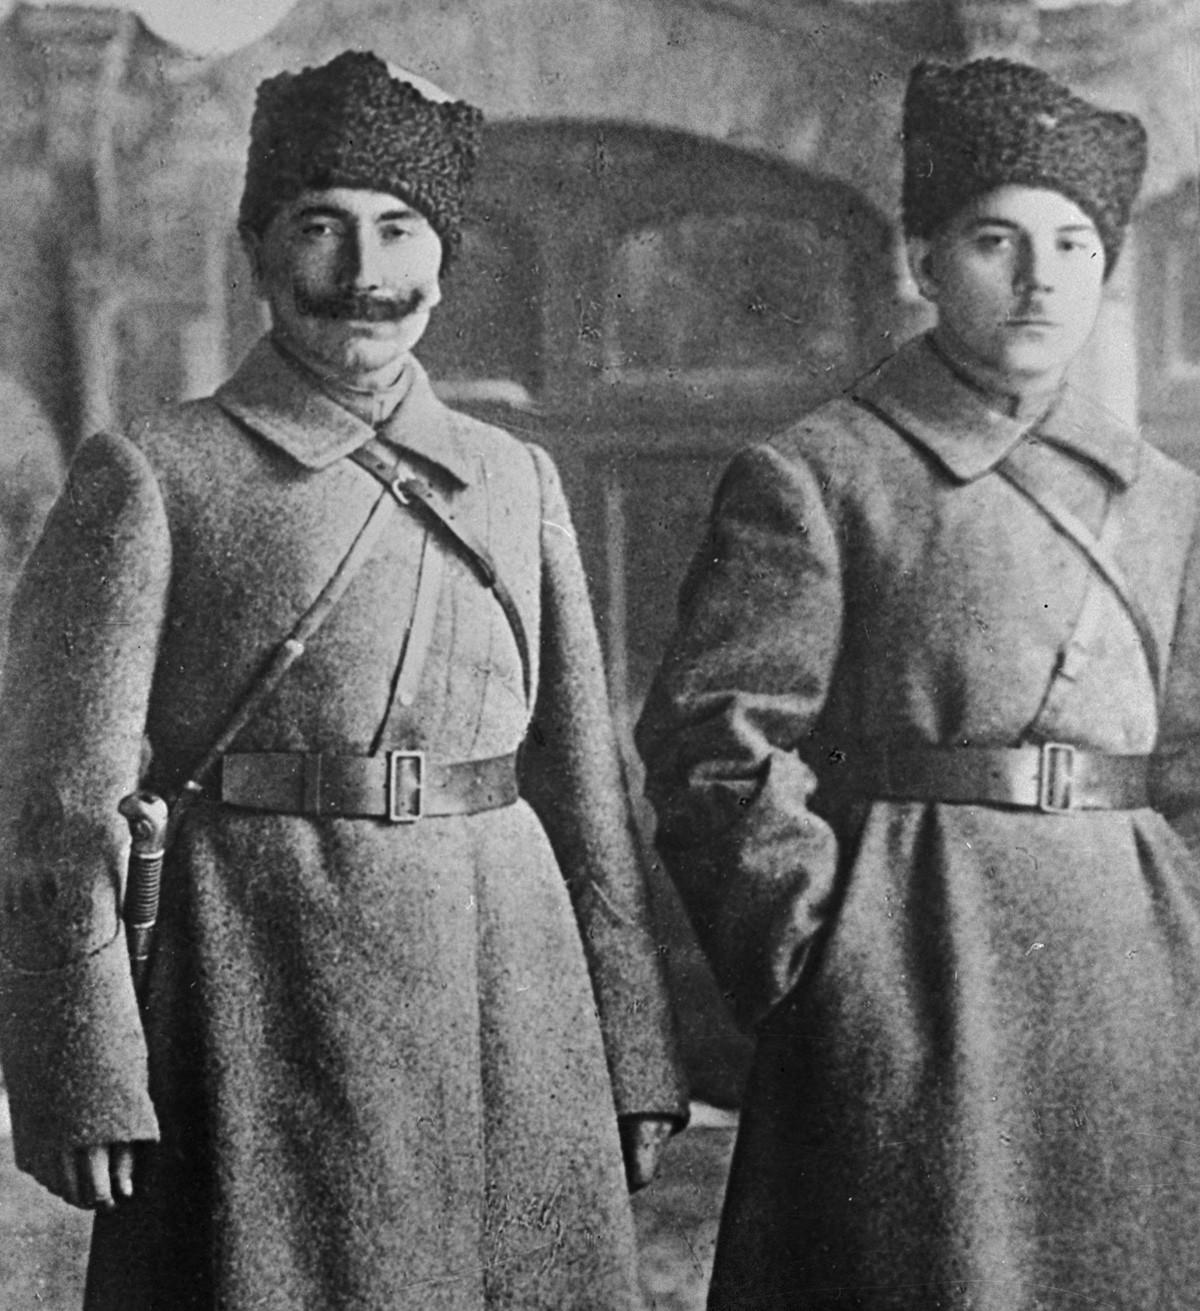 Климент Јефремович Ворошилов и Семјон Михајлович Буђони на Северно-кавкаском фронту, 1918.